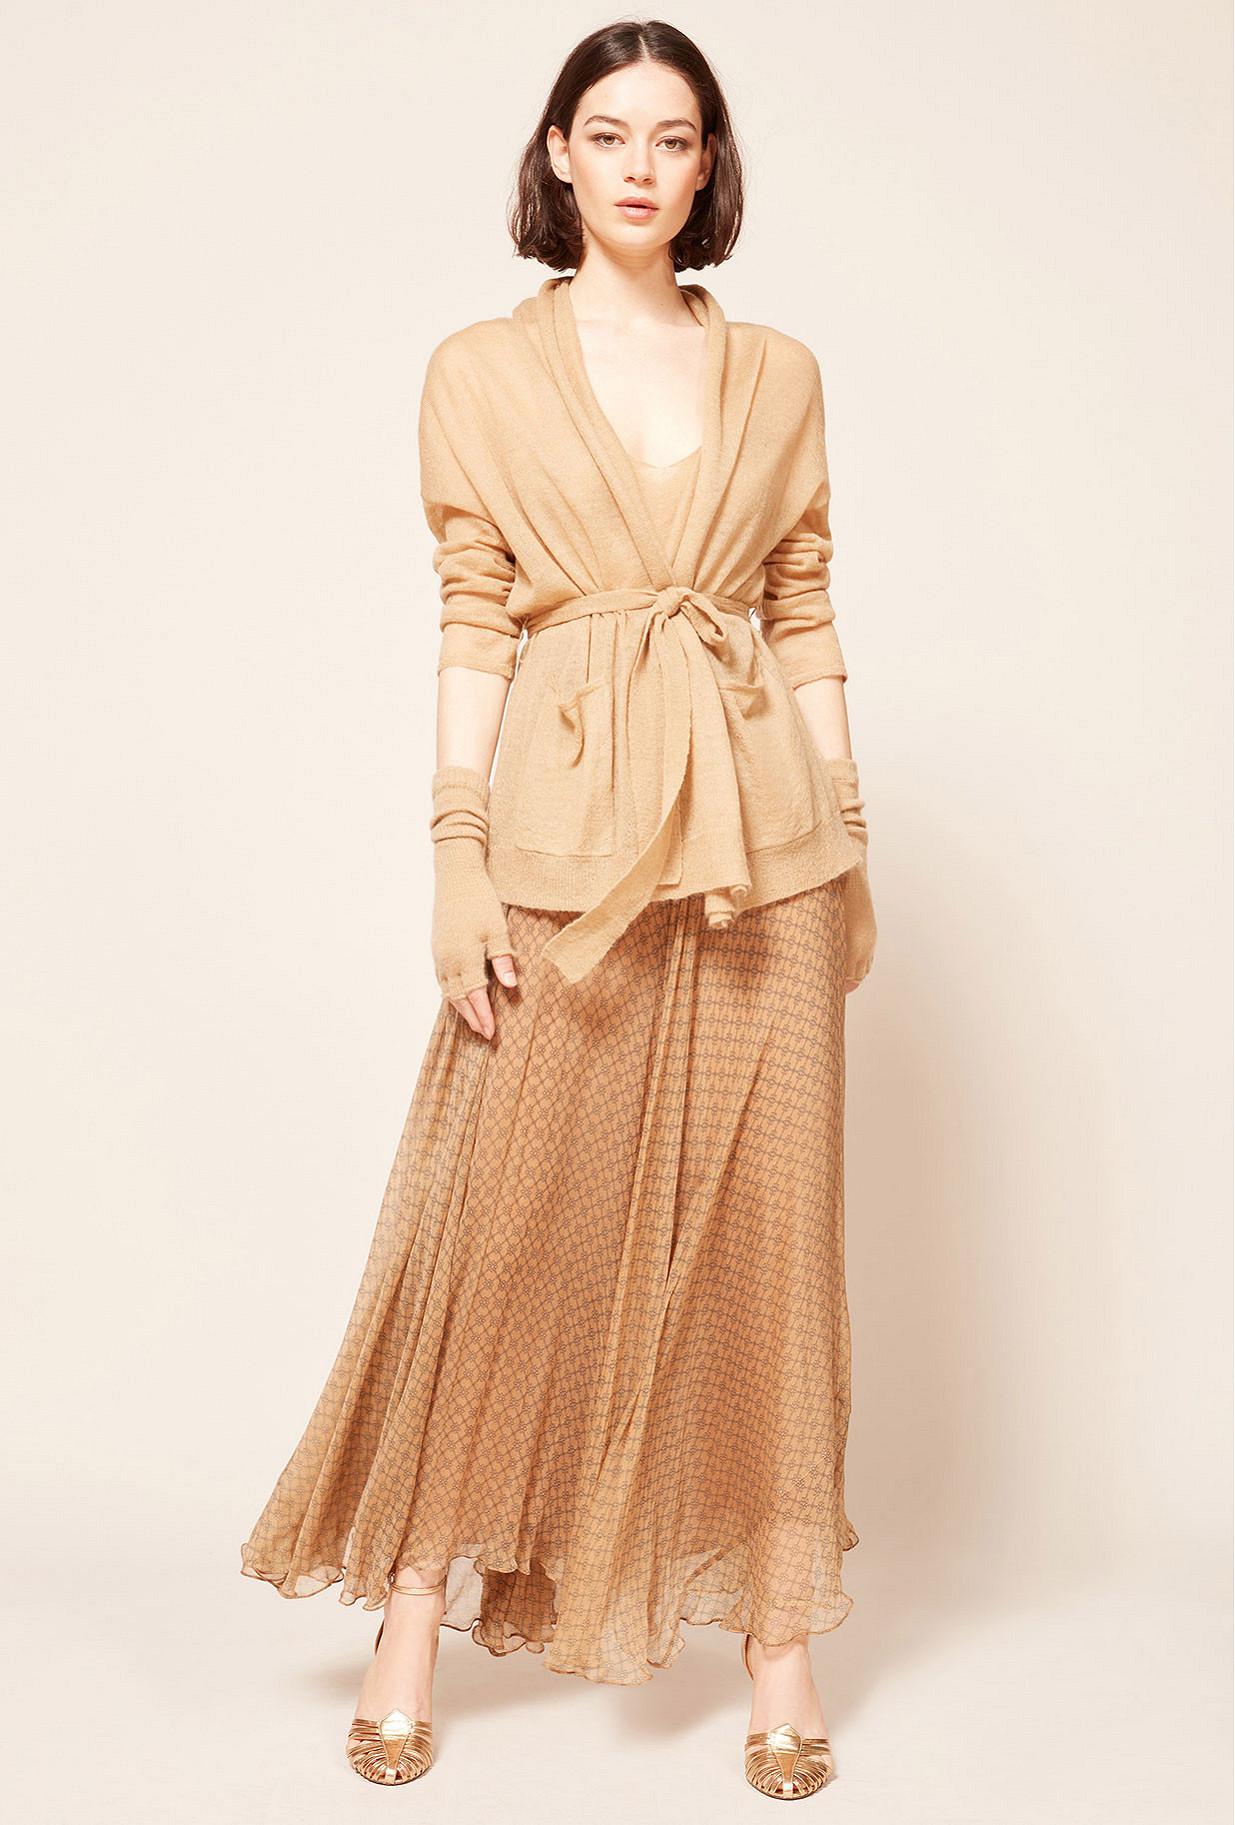 Paris clothes store Cardigan  Saxofon french designer fashion Paris